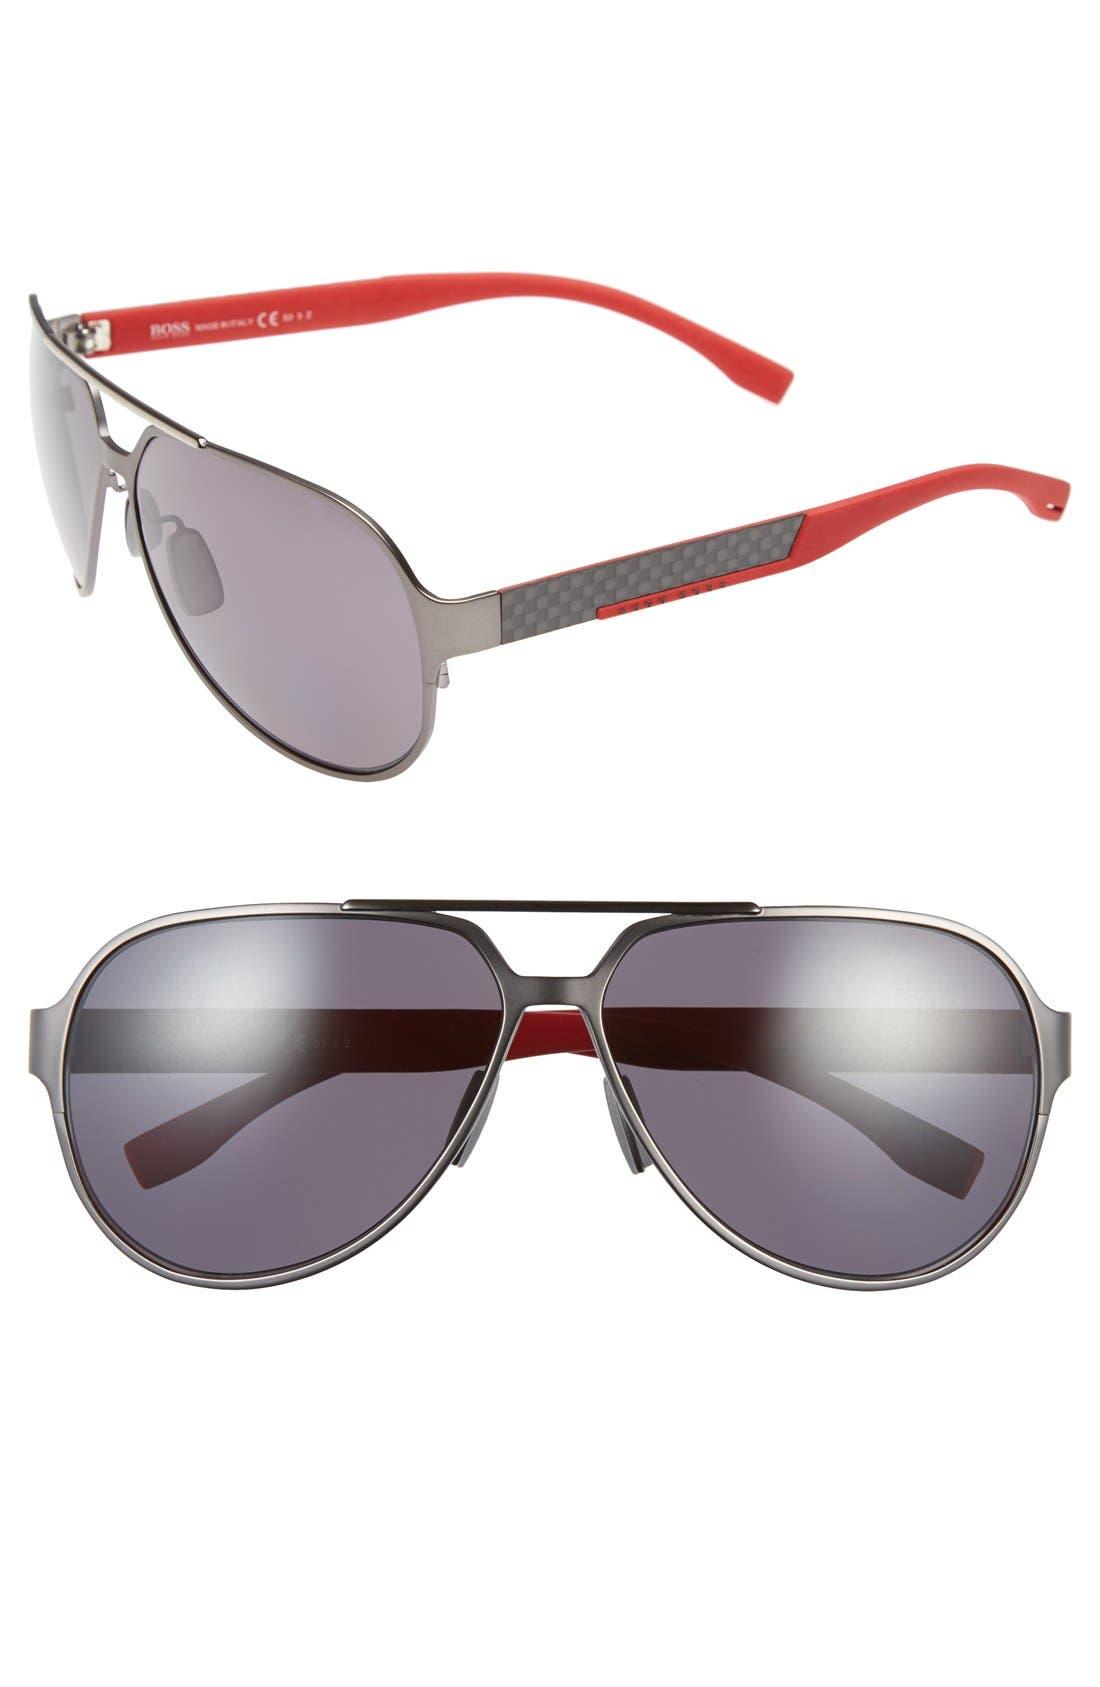 63mm Polarized Aviator Sunglasses,                             Main thumbnail 1, color,                             043